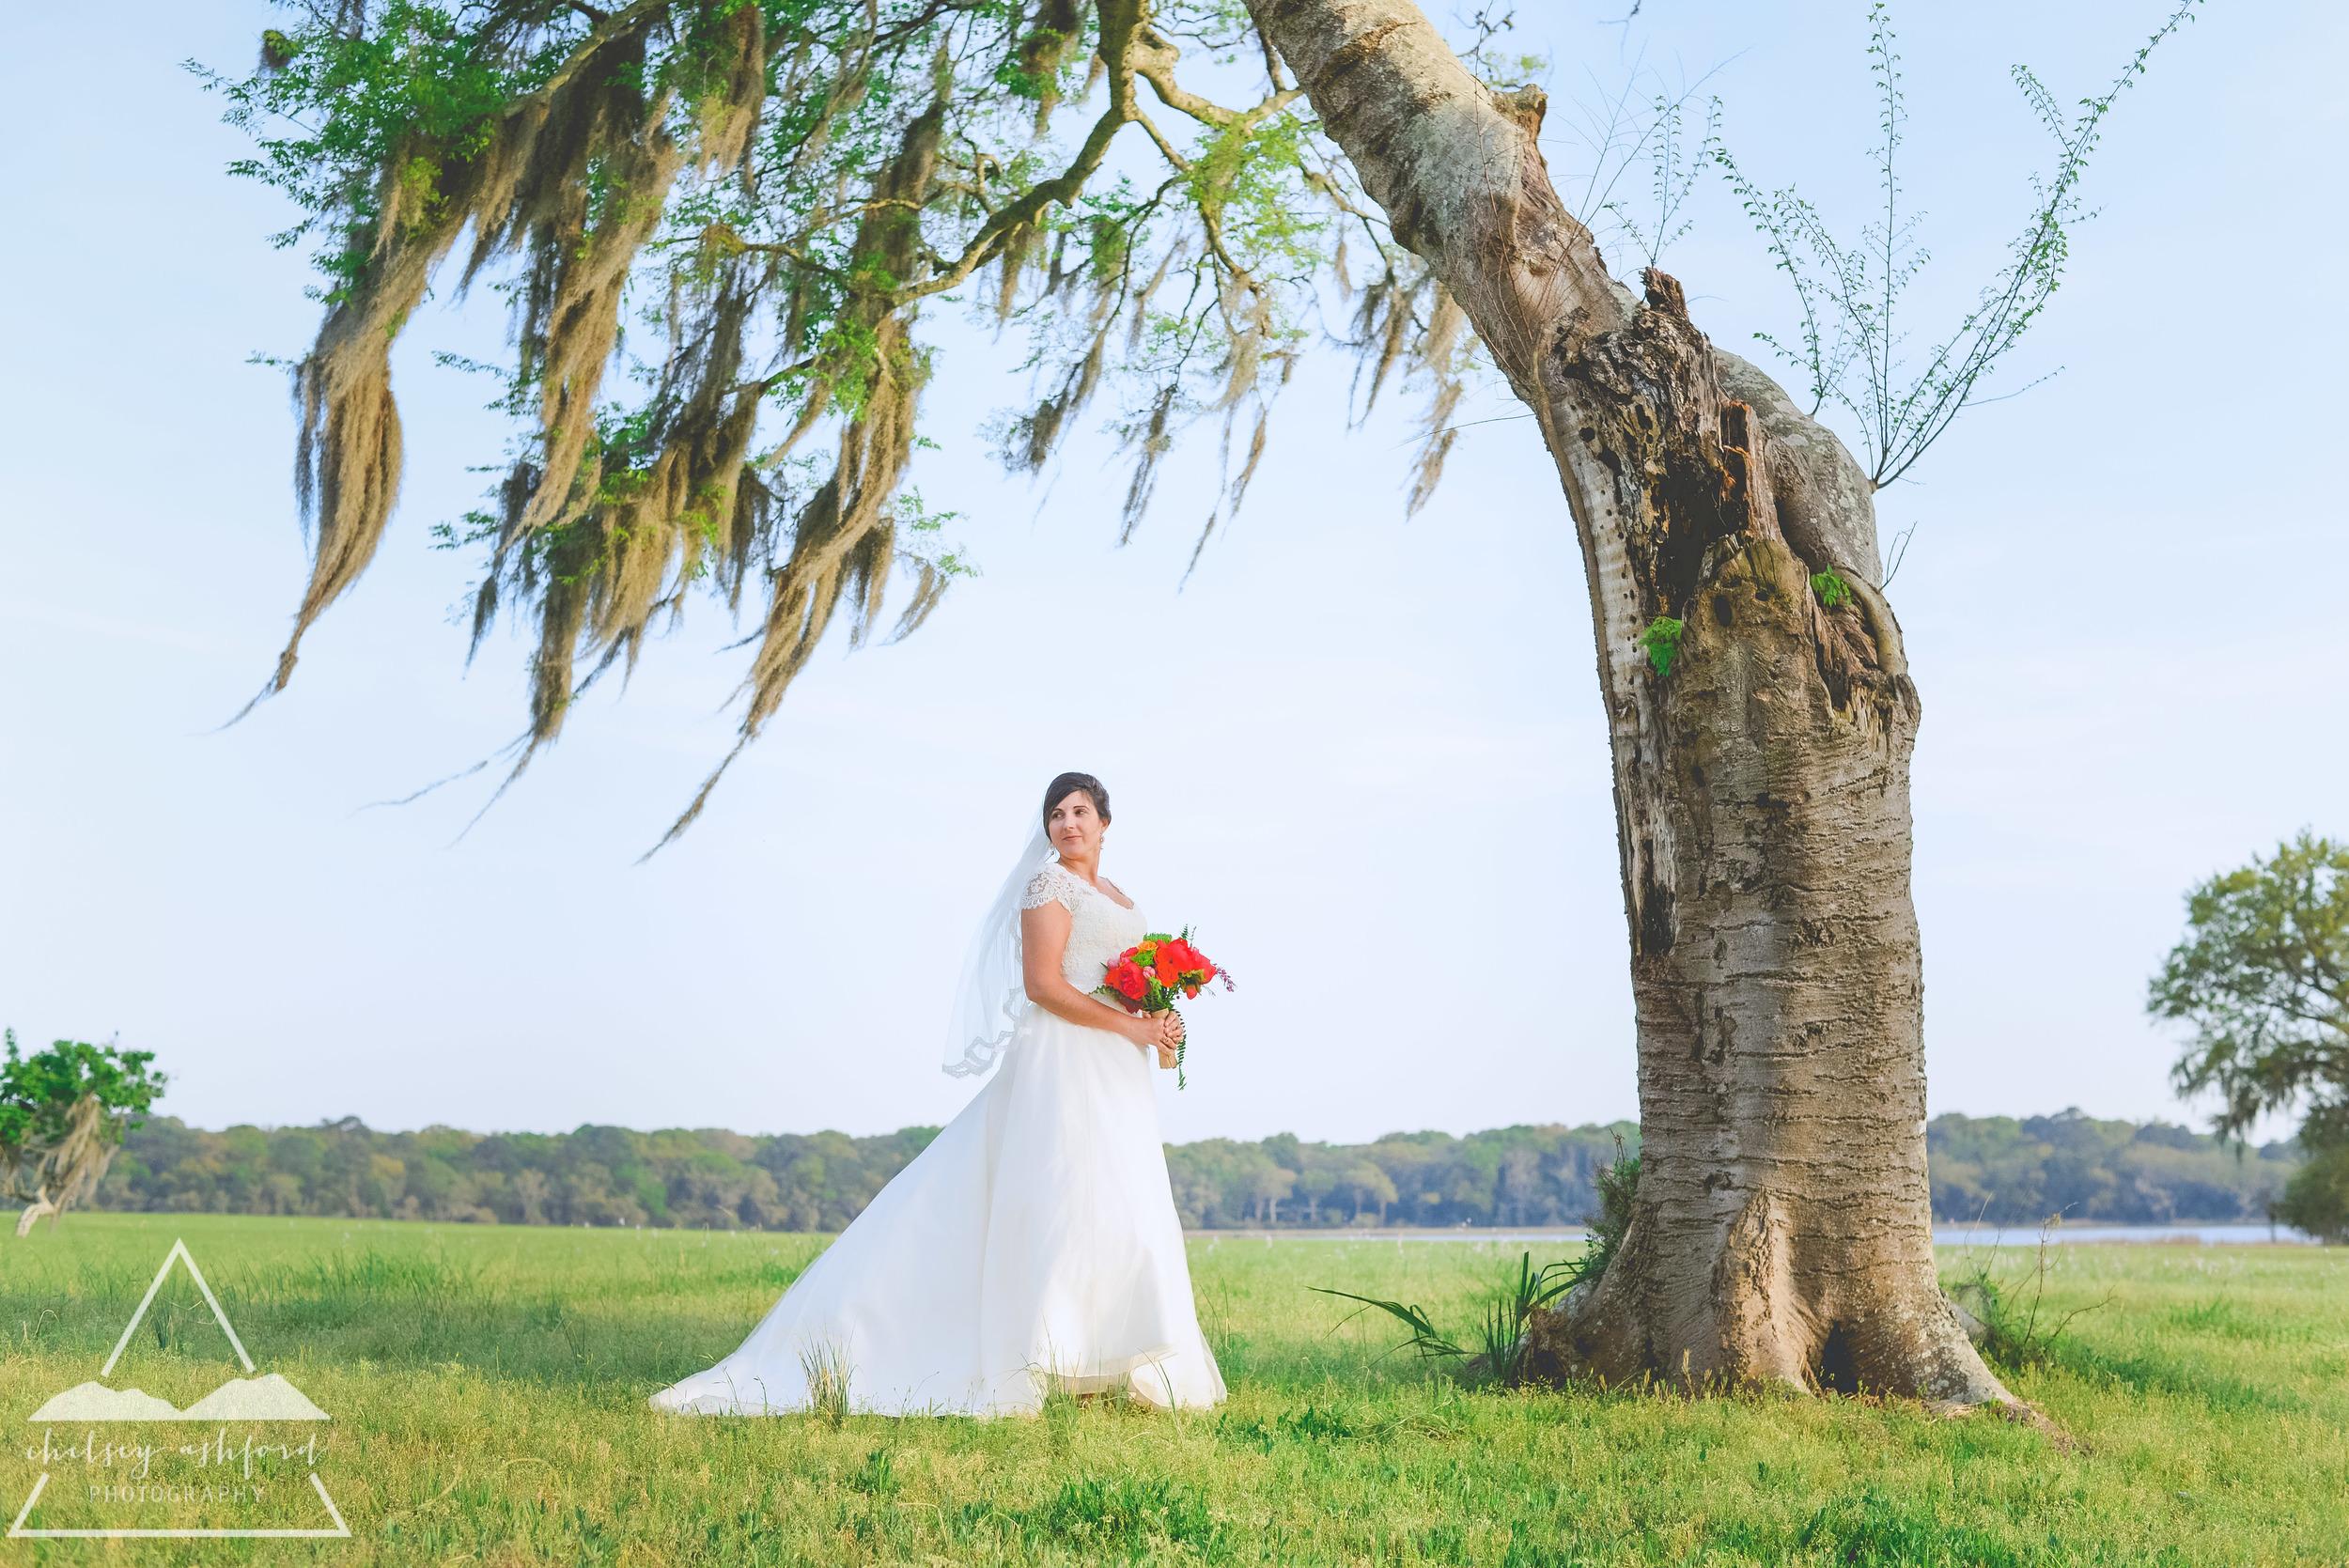 Sylvia_bridals_web-33.jpg